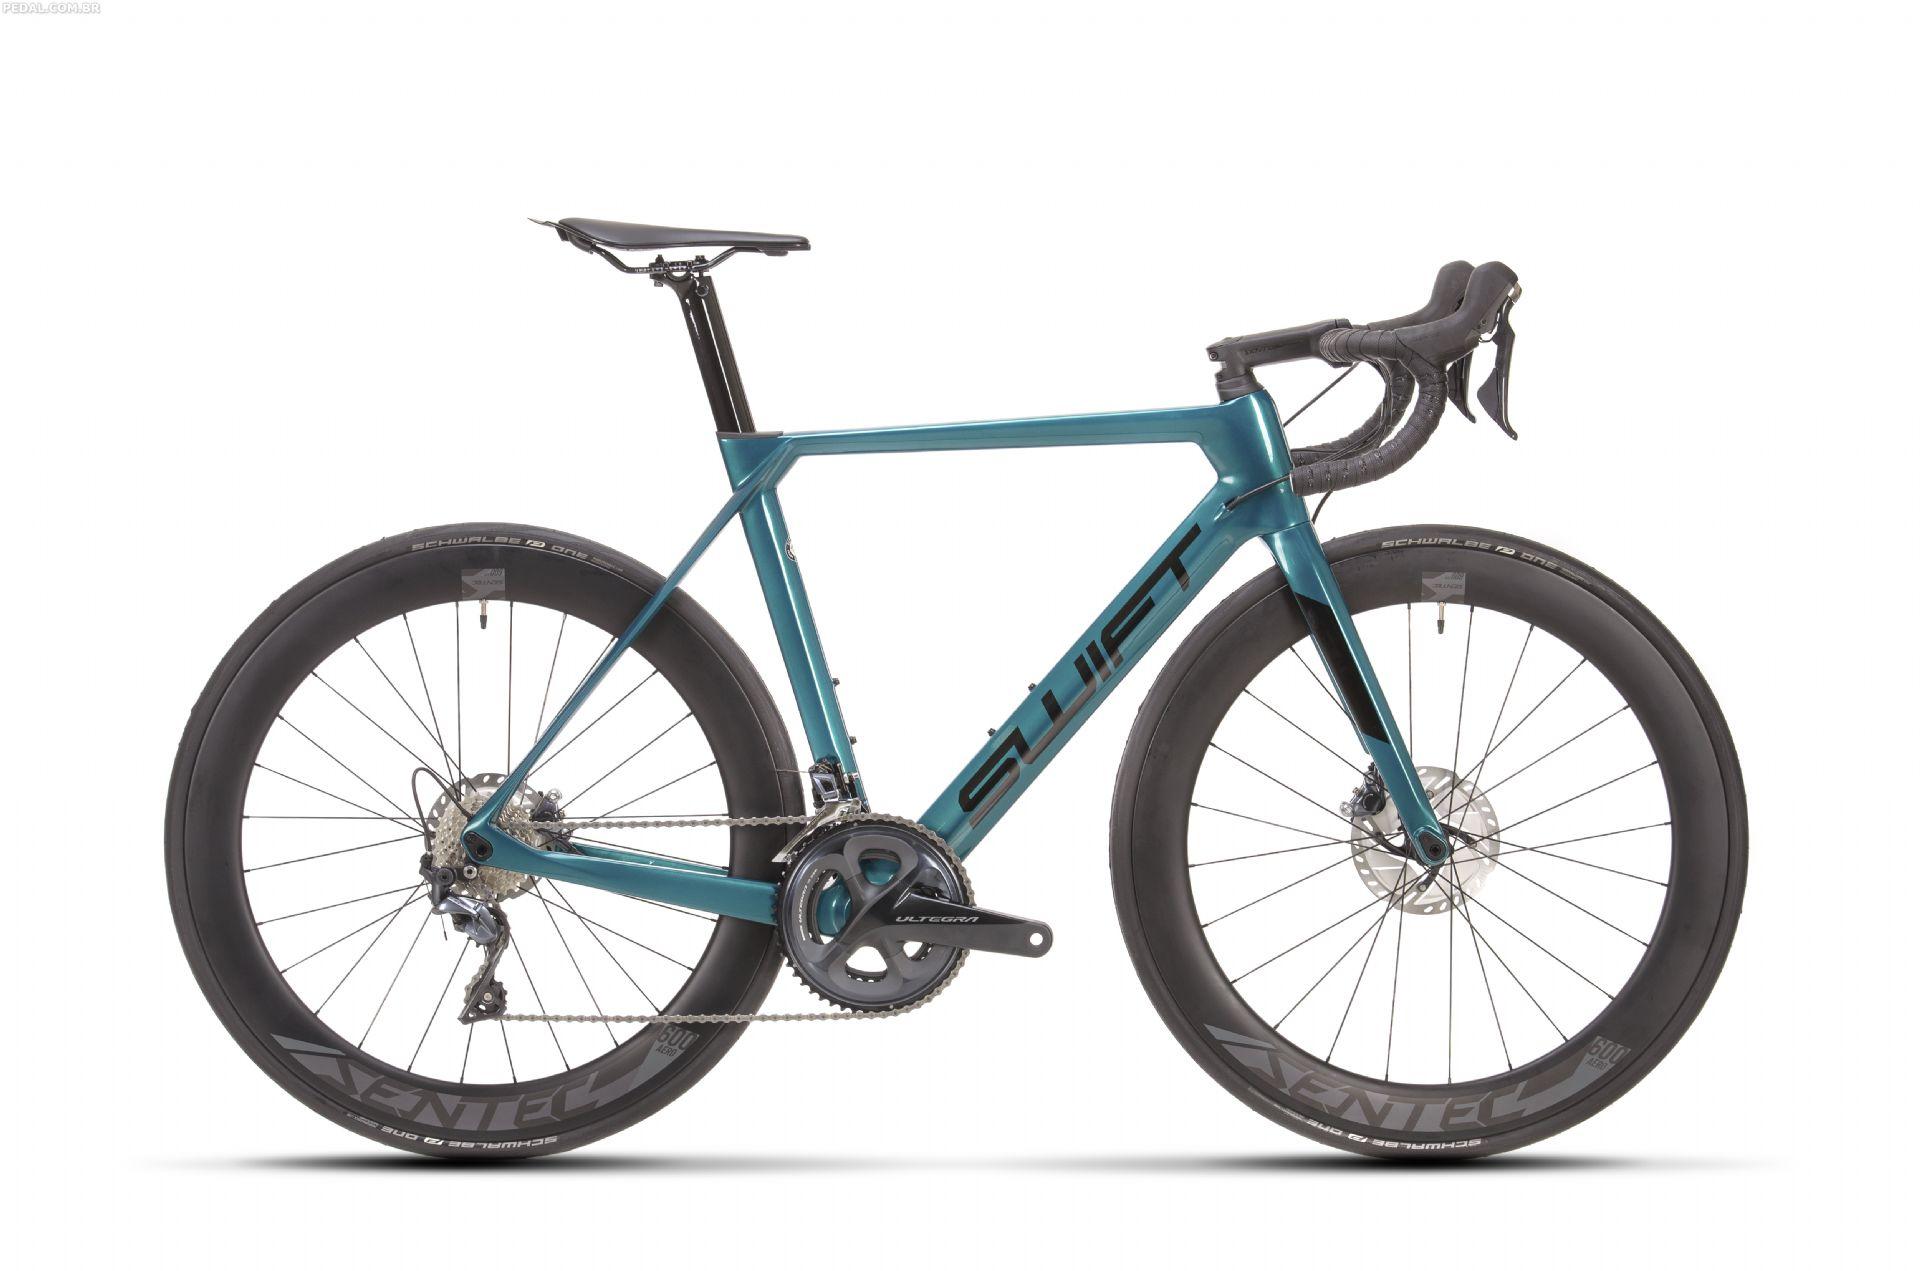 Bicicleta Speed Swift Carbon Hypervox Disc (sense)